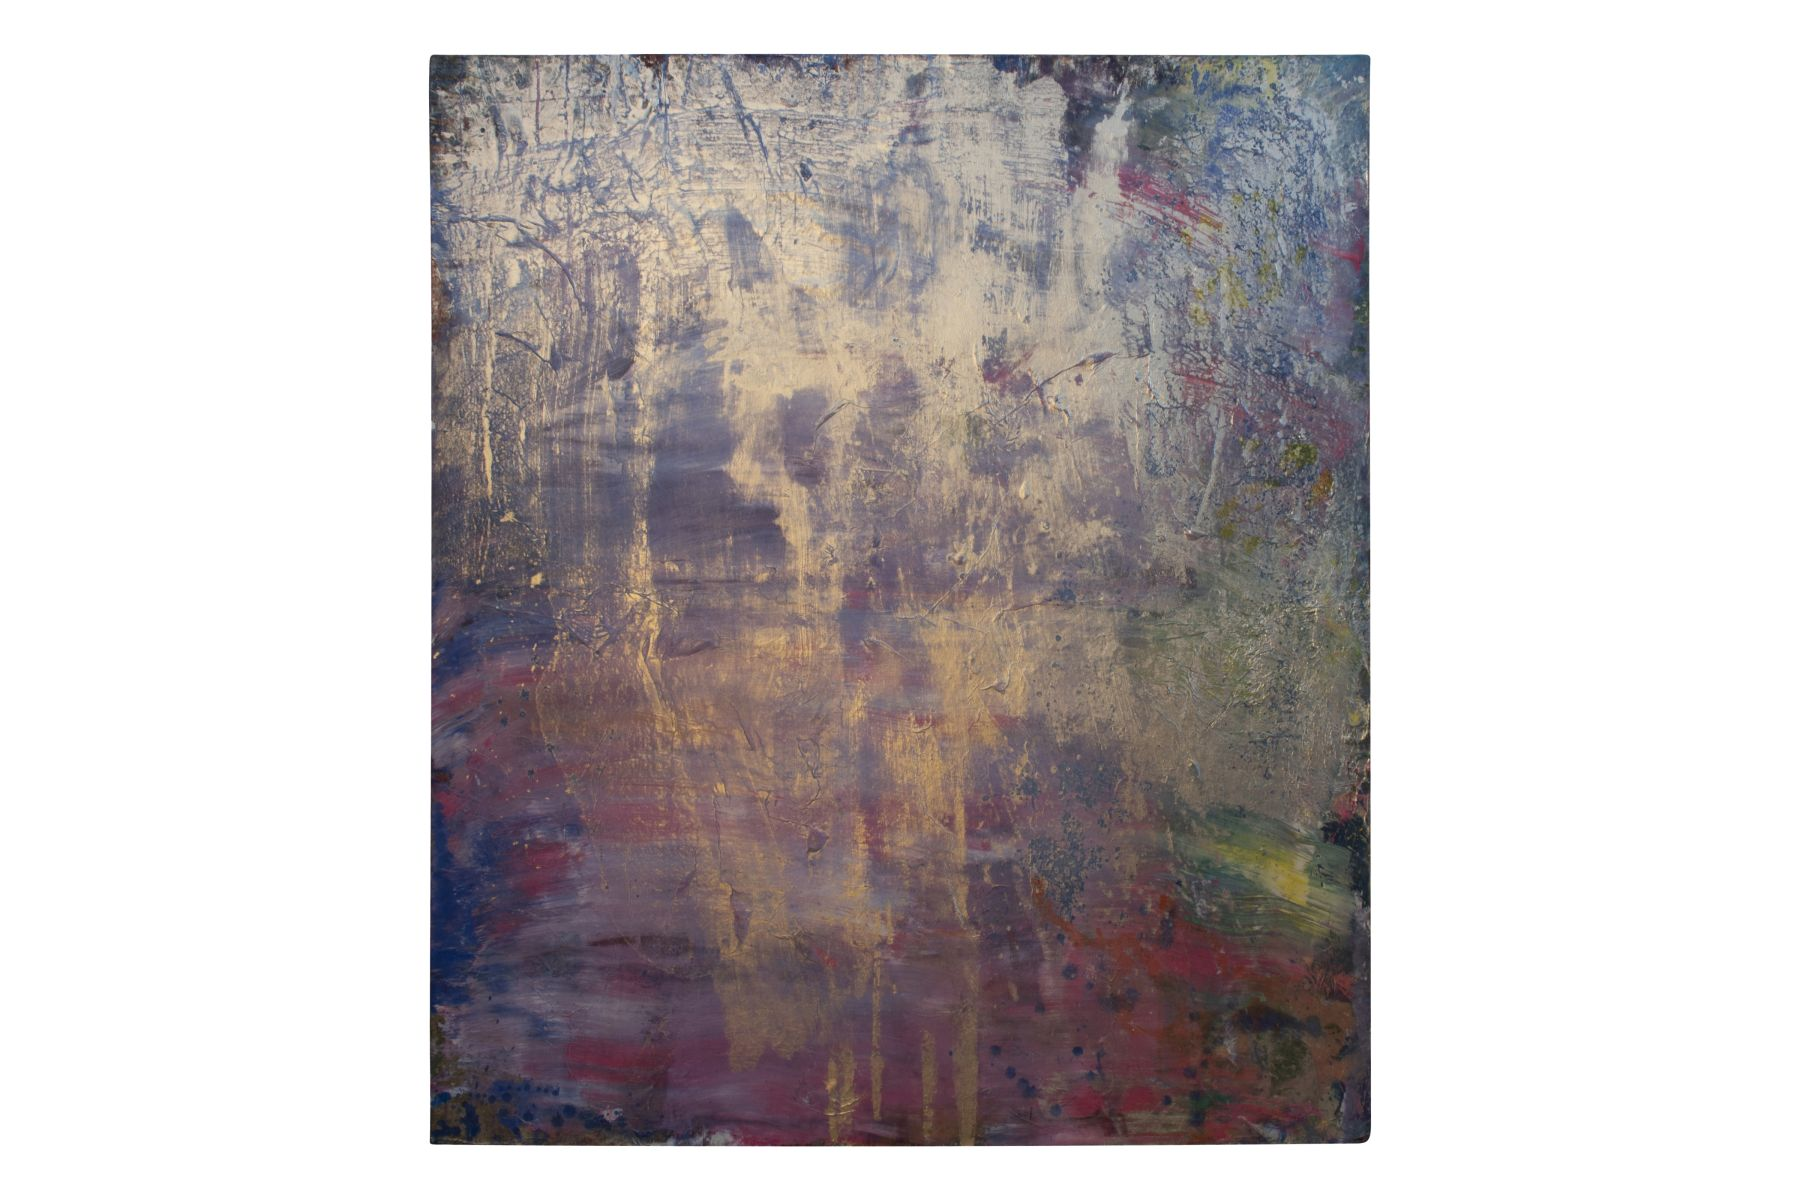 "#68 Nikolaus Moser(1956), ""Silence"" | Nikolaus Moser(1956), ""Stille"" Image"